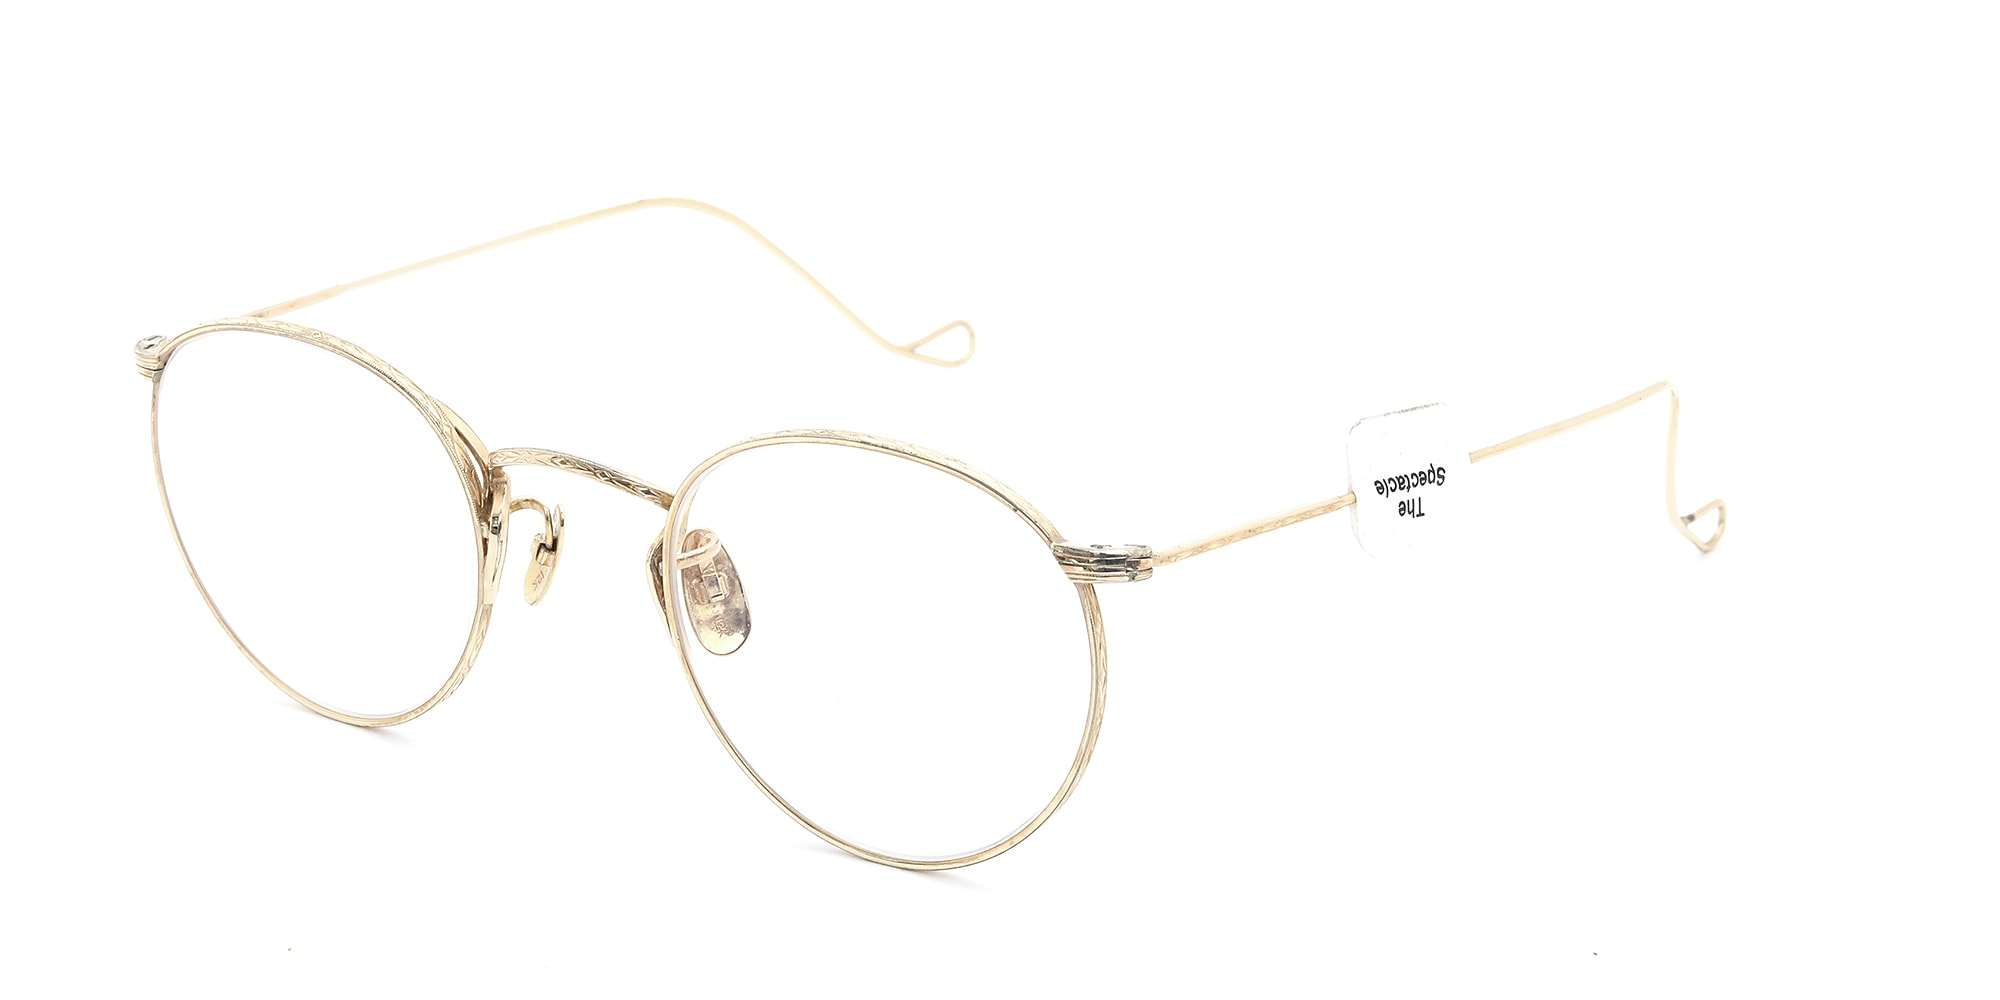 The Spectacle メガネ 1937 Artcraft Optical The-Artbit NOKOROD P-6 G 12kPads 46-22 イメージ2